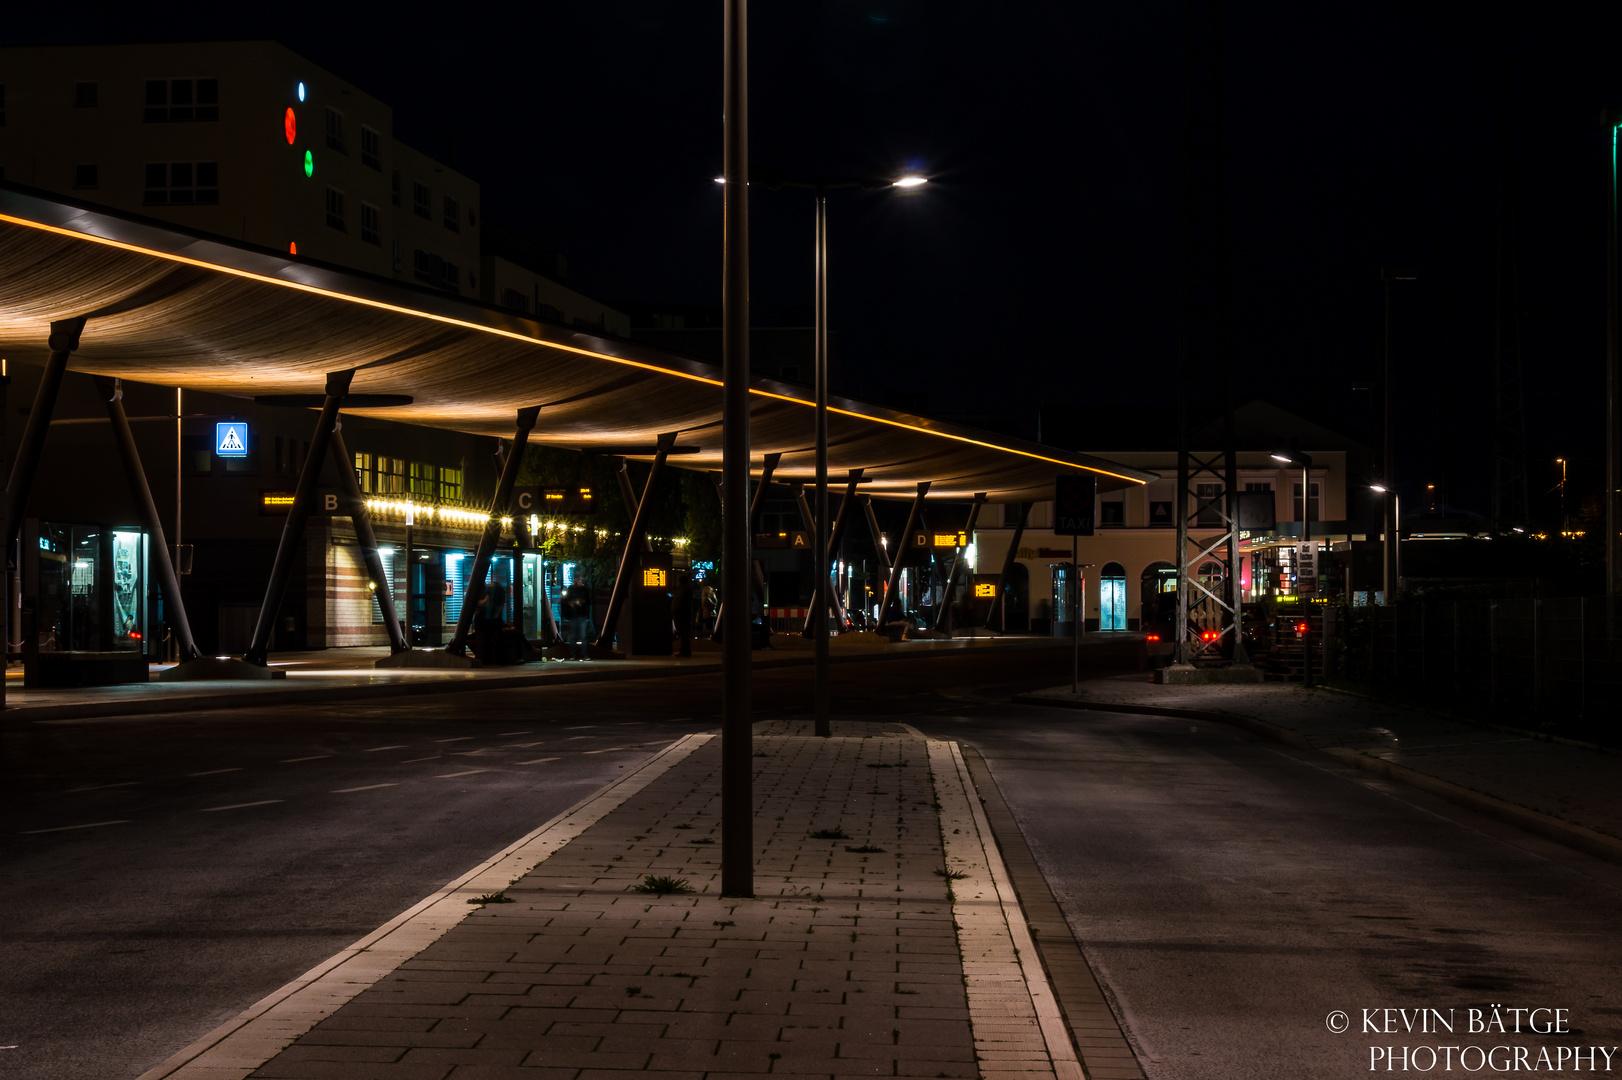 Busbahnhof Unna